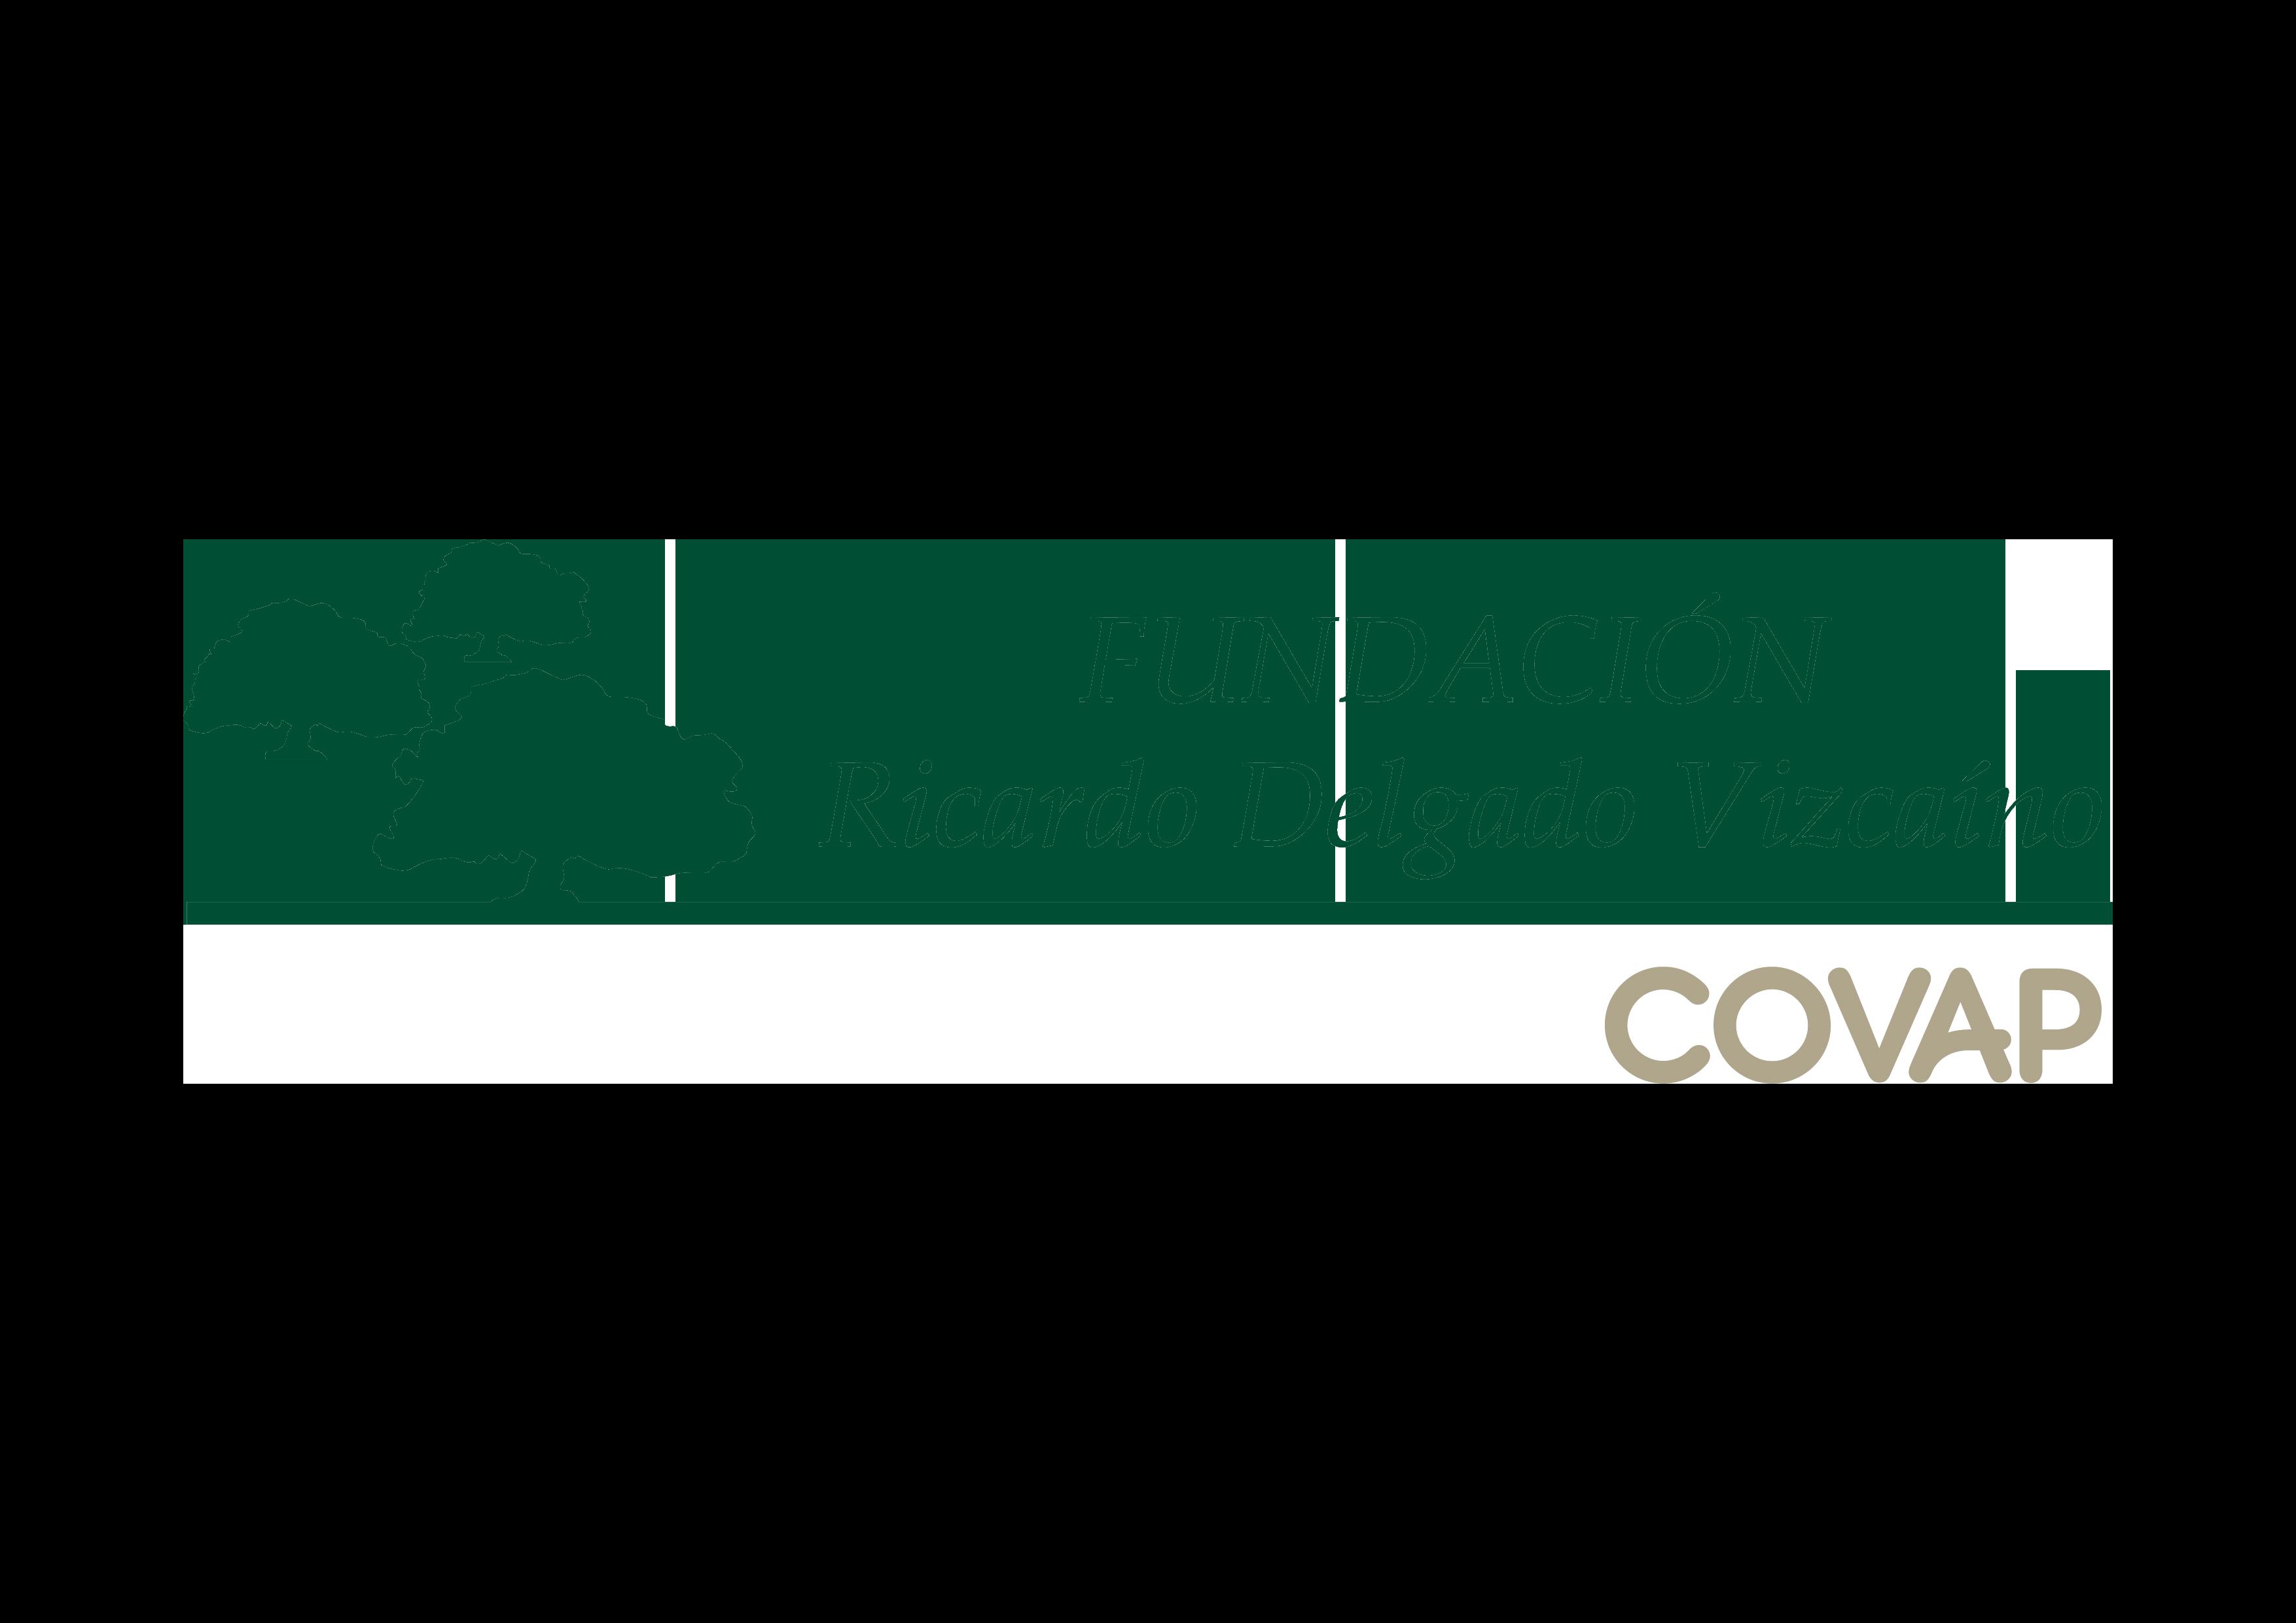 Premios de bachillerato FRDV | COVAP